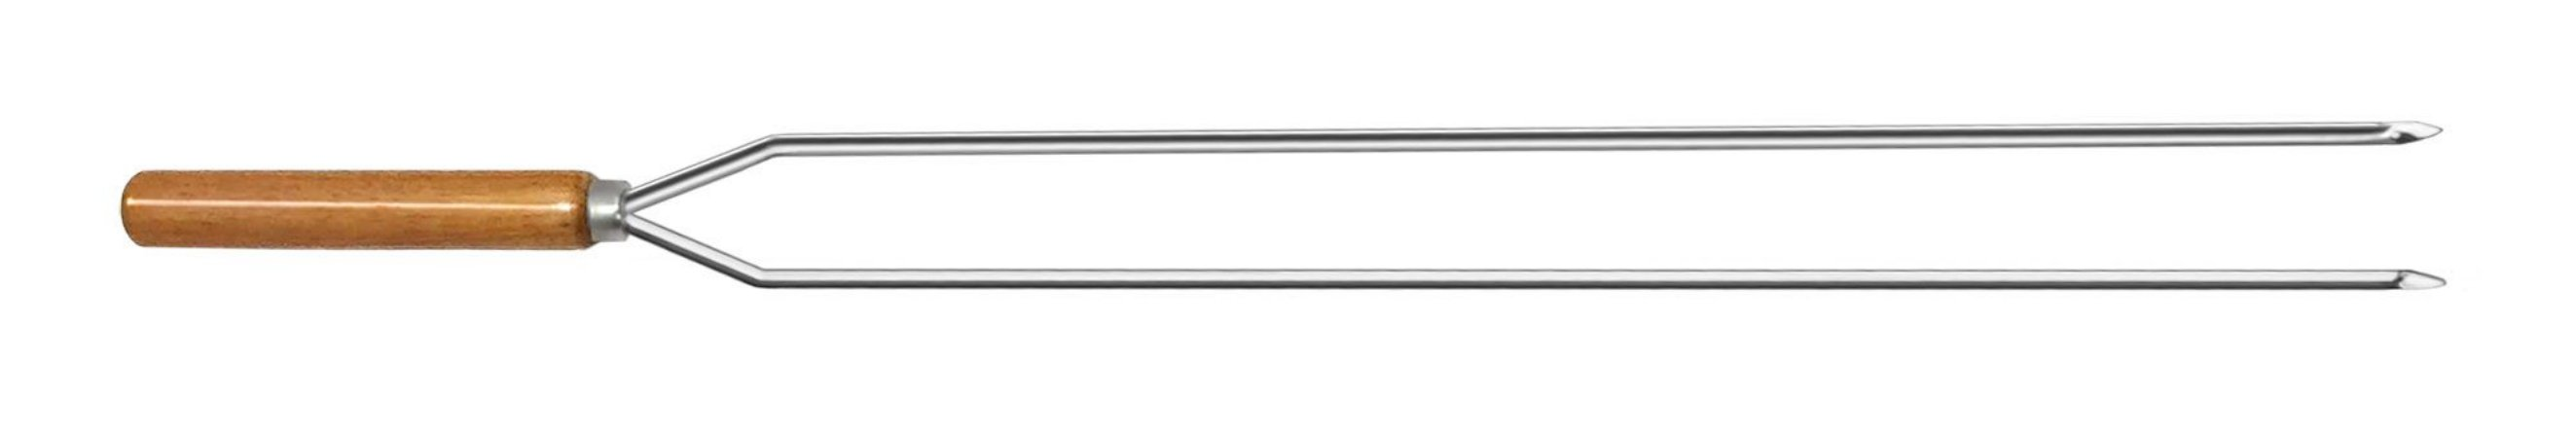 Espeto Inox Cupim Duplo 090 cm x 1,5 mm